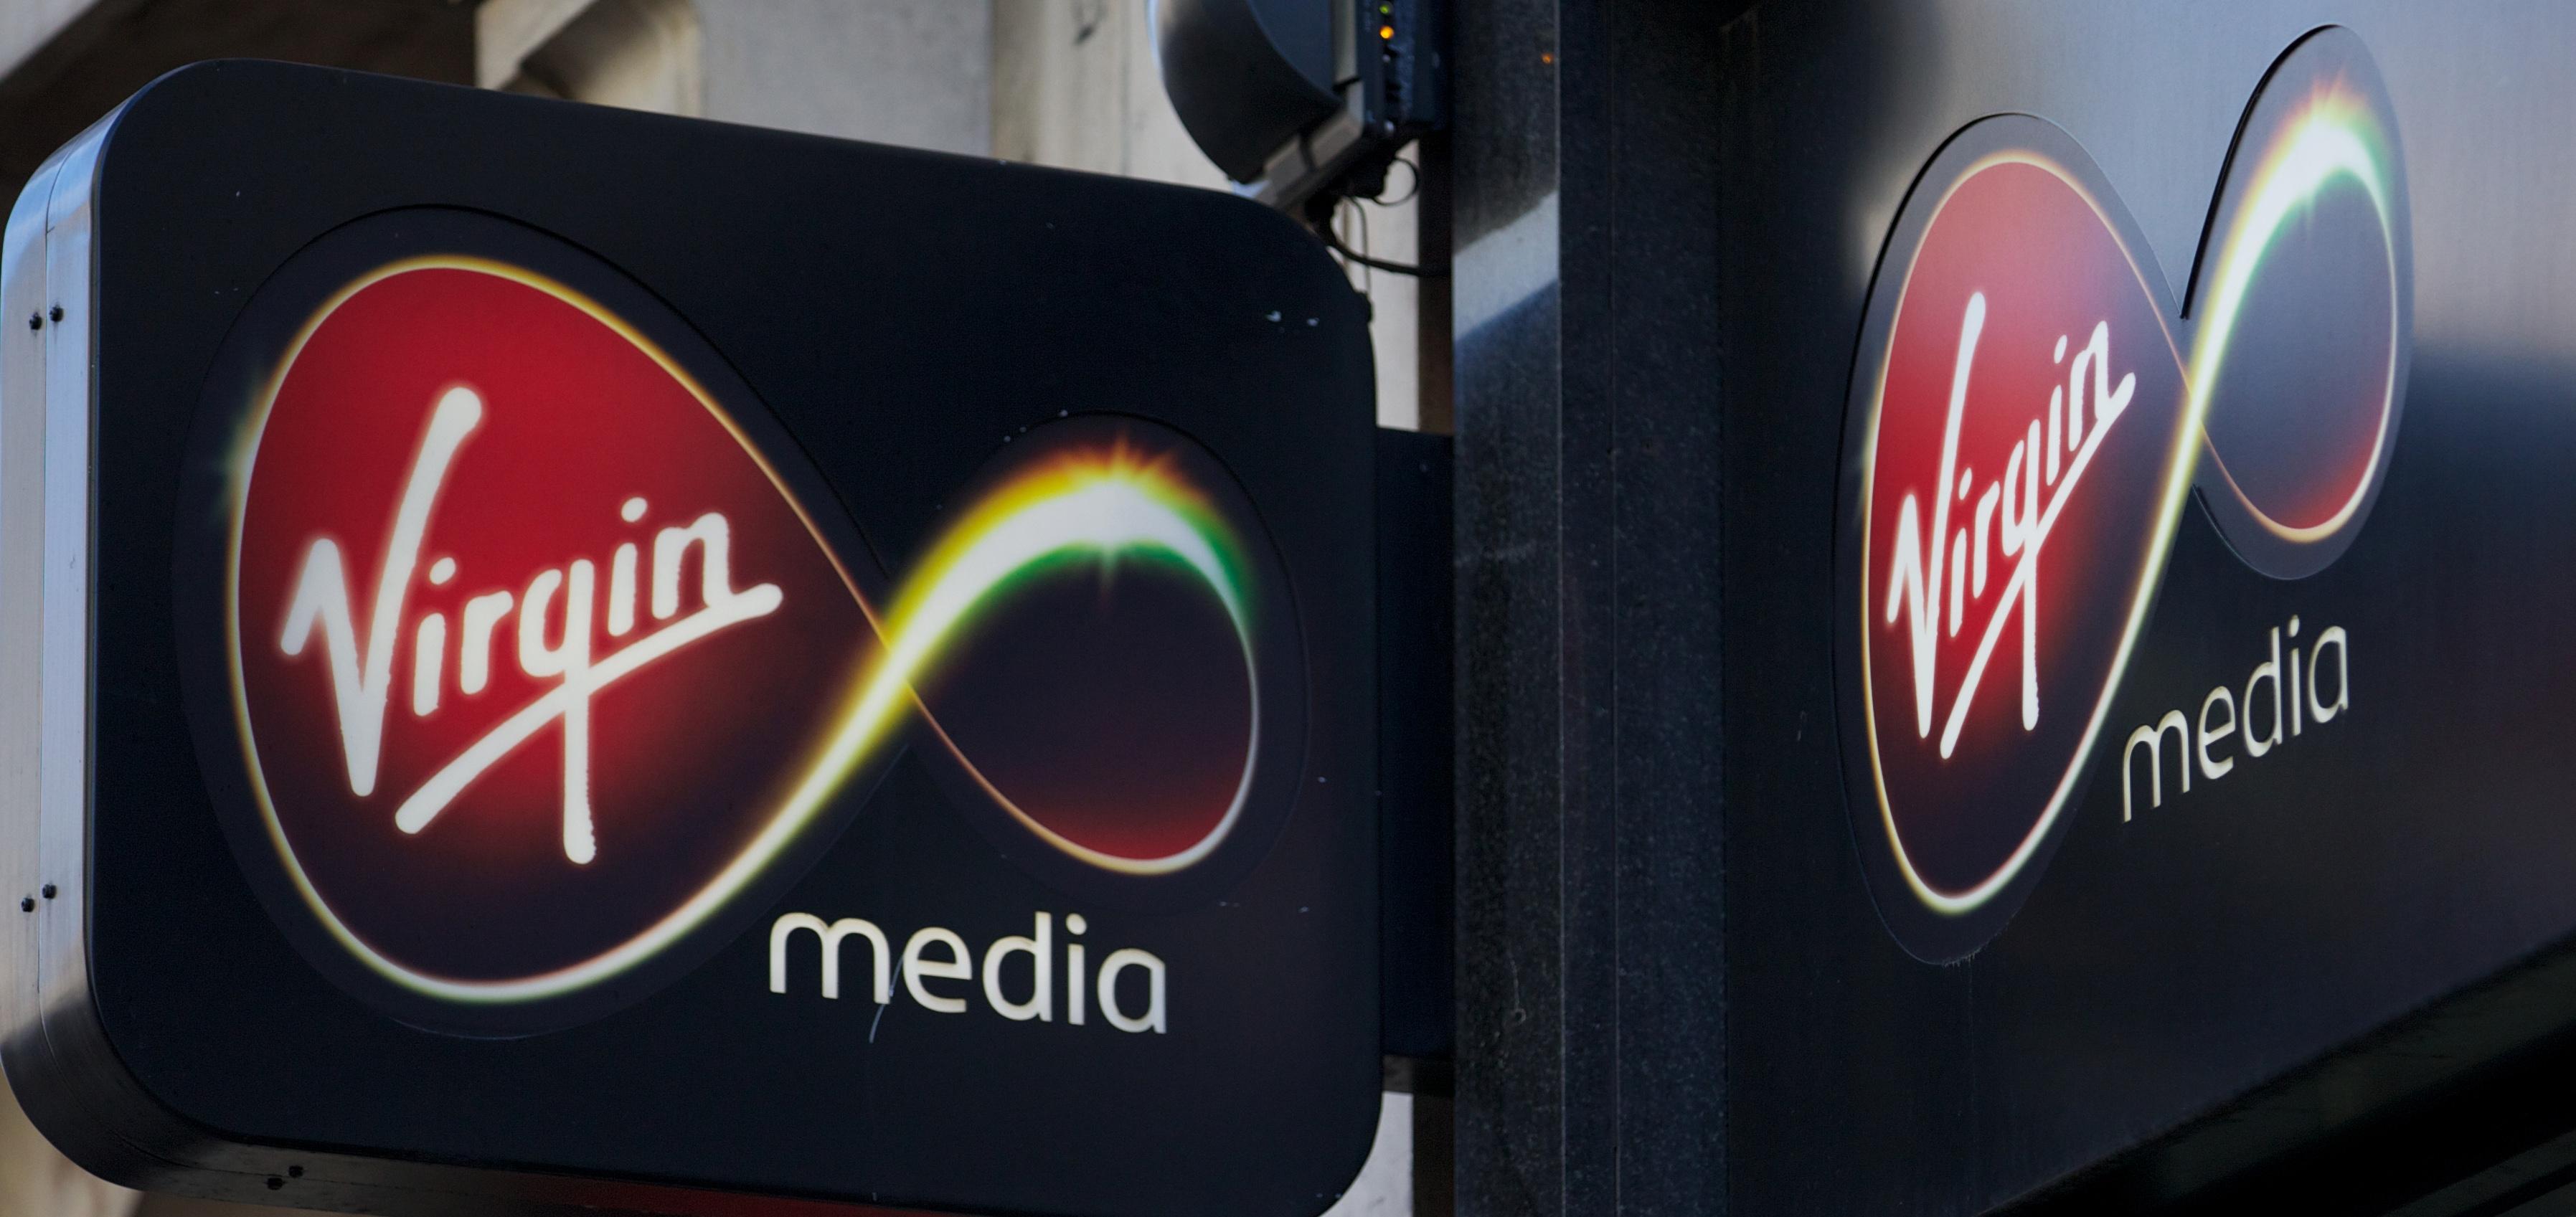 Virgin Media Launches Quad-Play Bundles